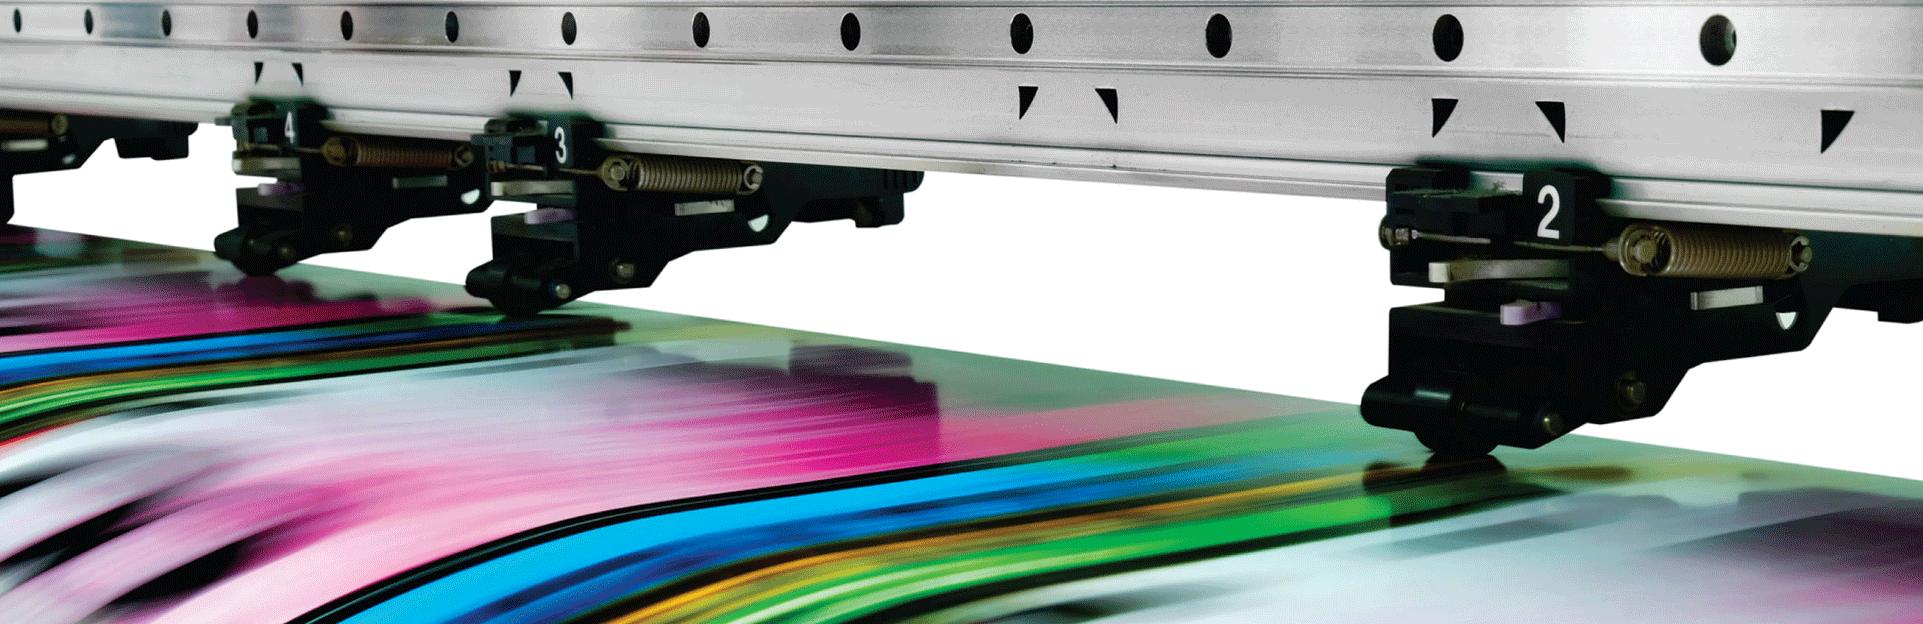 LTTR-Printing